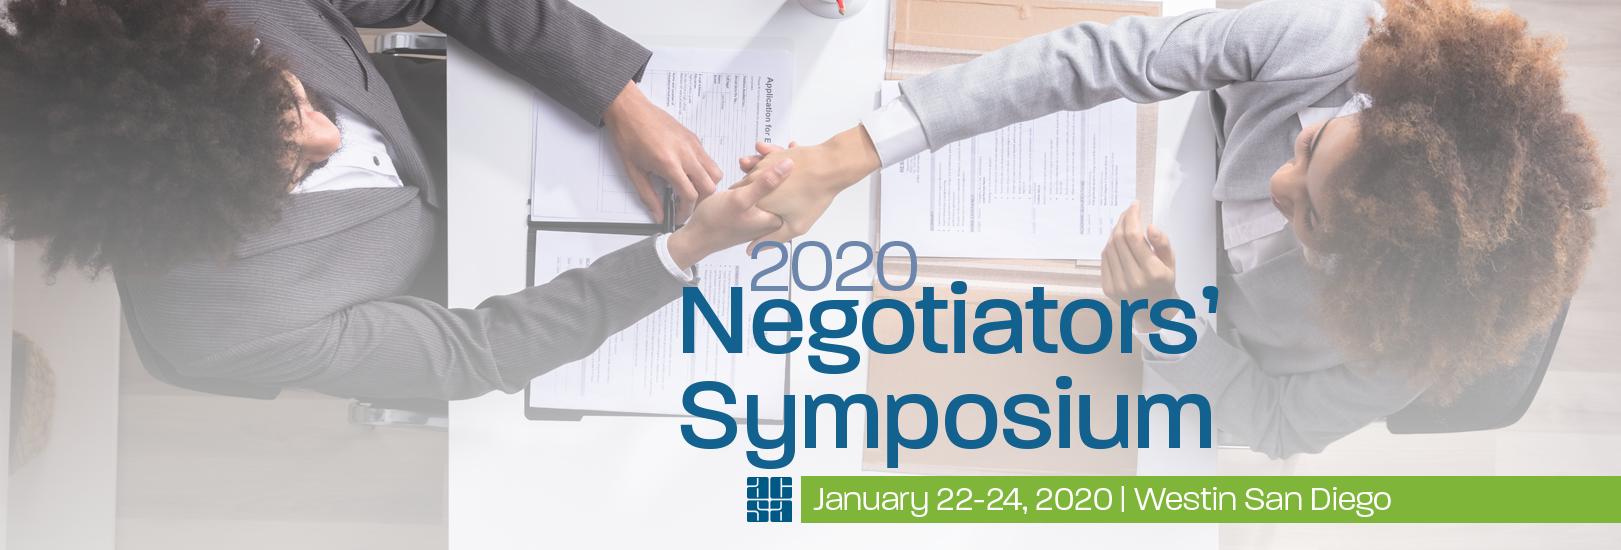 San Diego Calendar Of Events January 2020 ACSA's Negotiators' Symposium